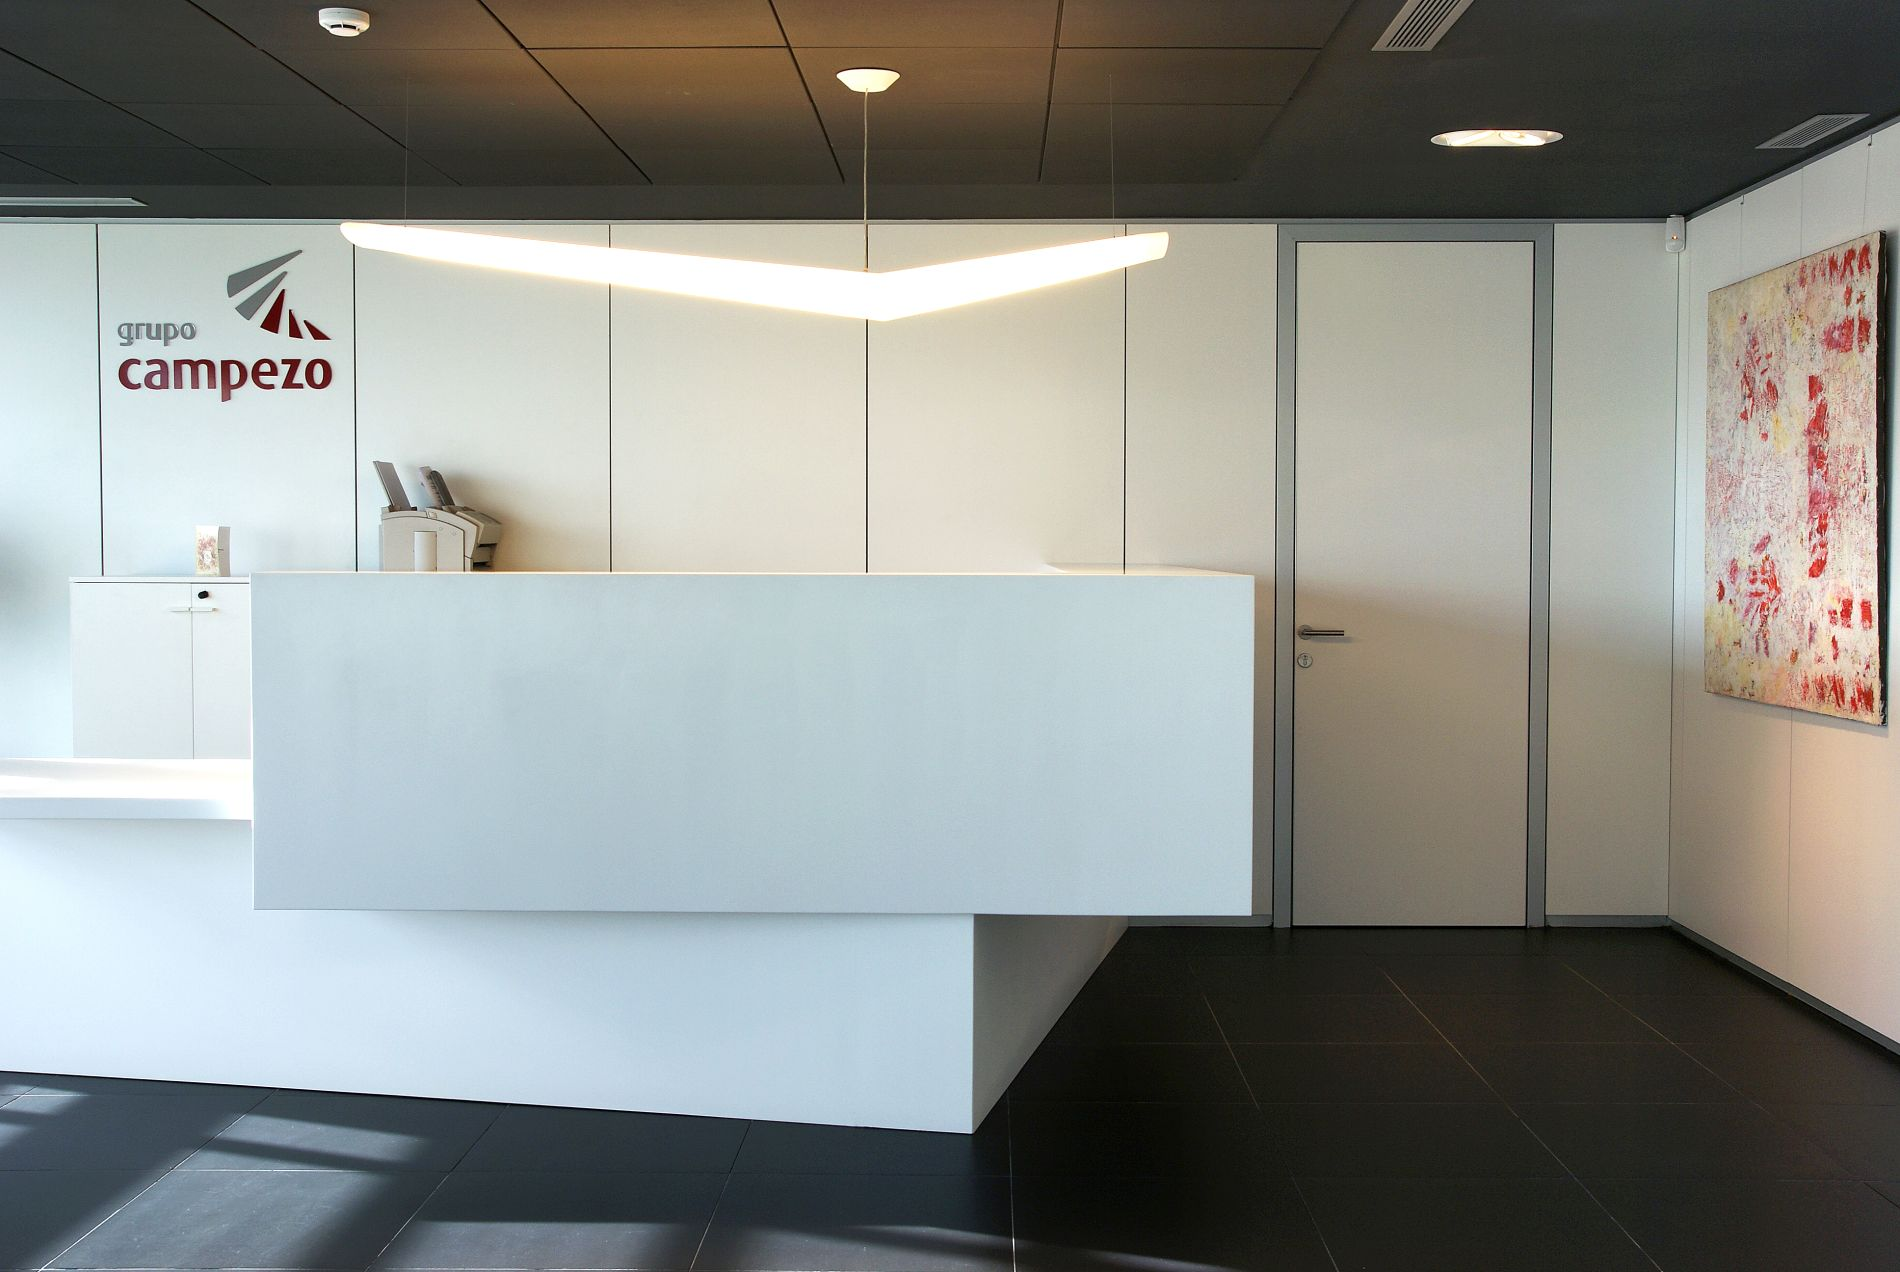 Fiark - Oficinas Campezo 24